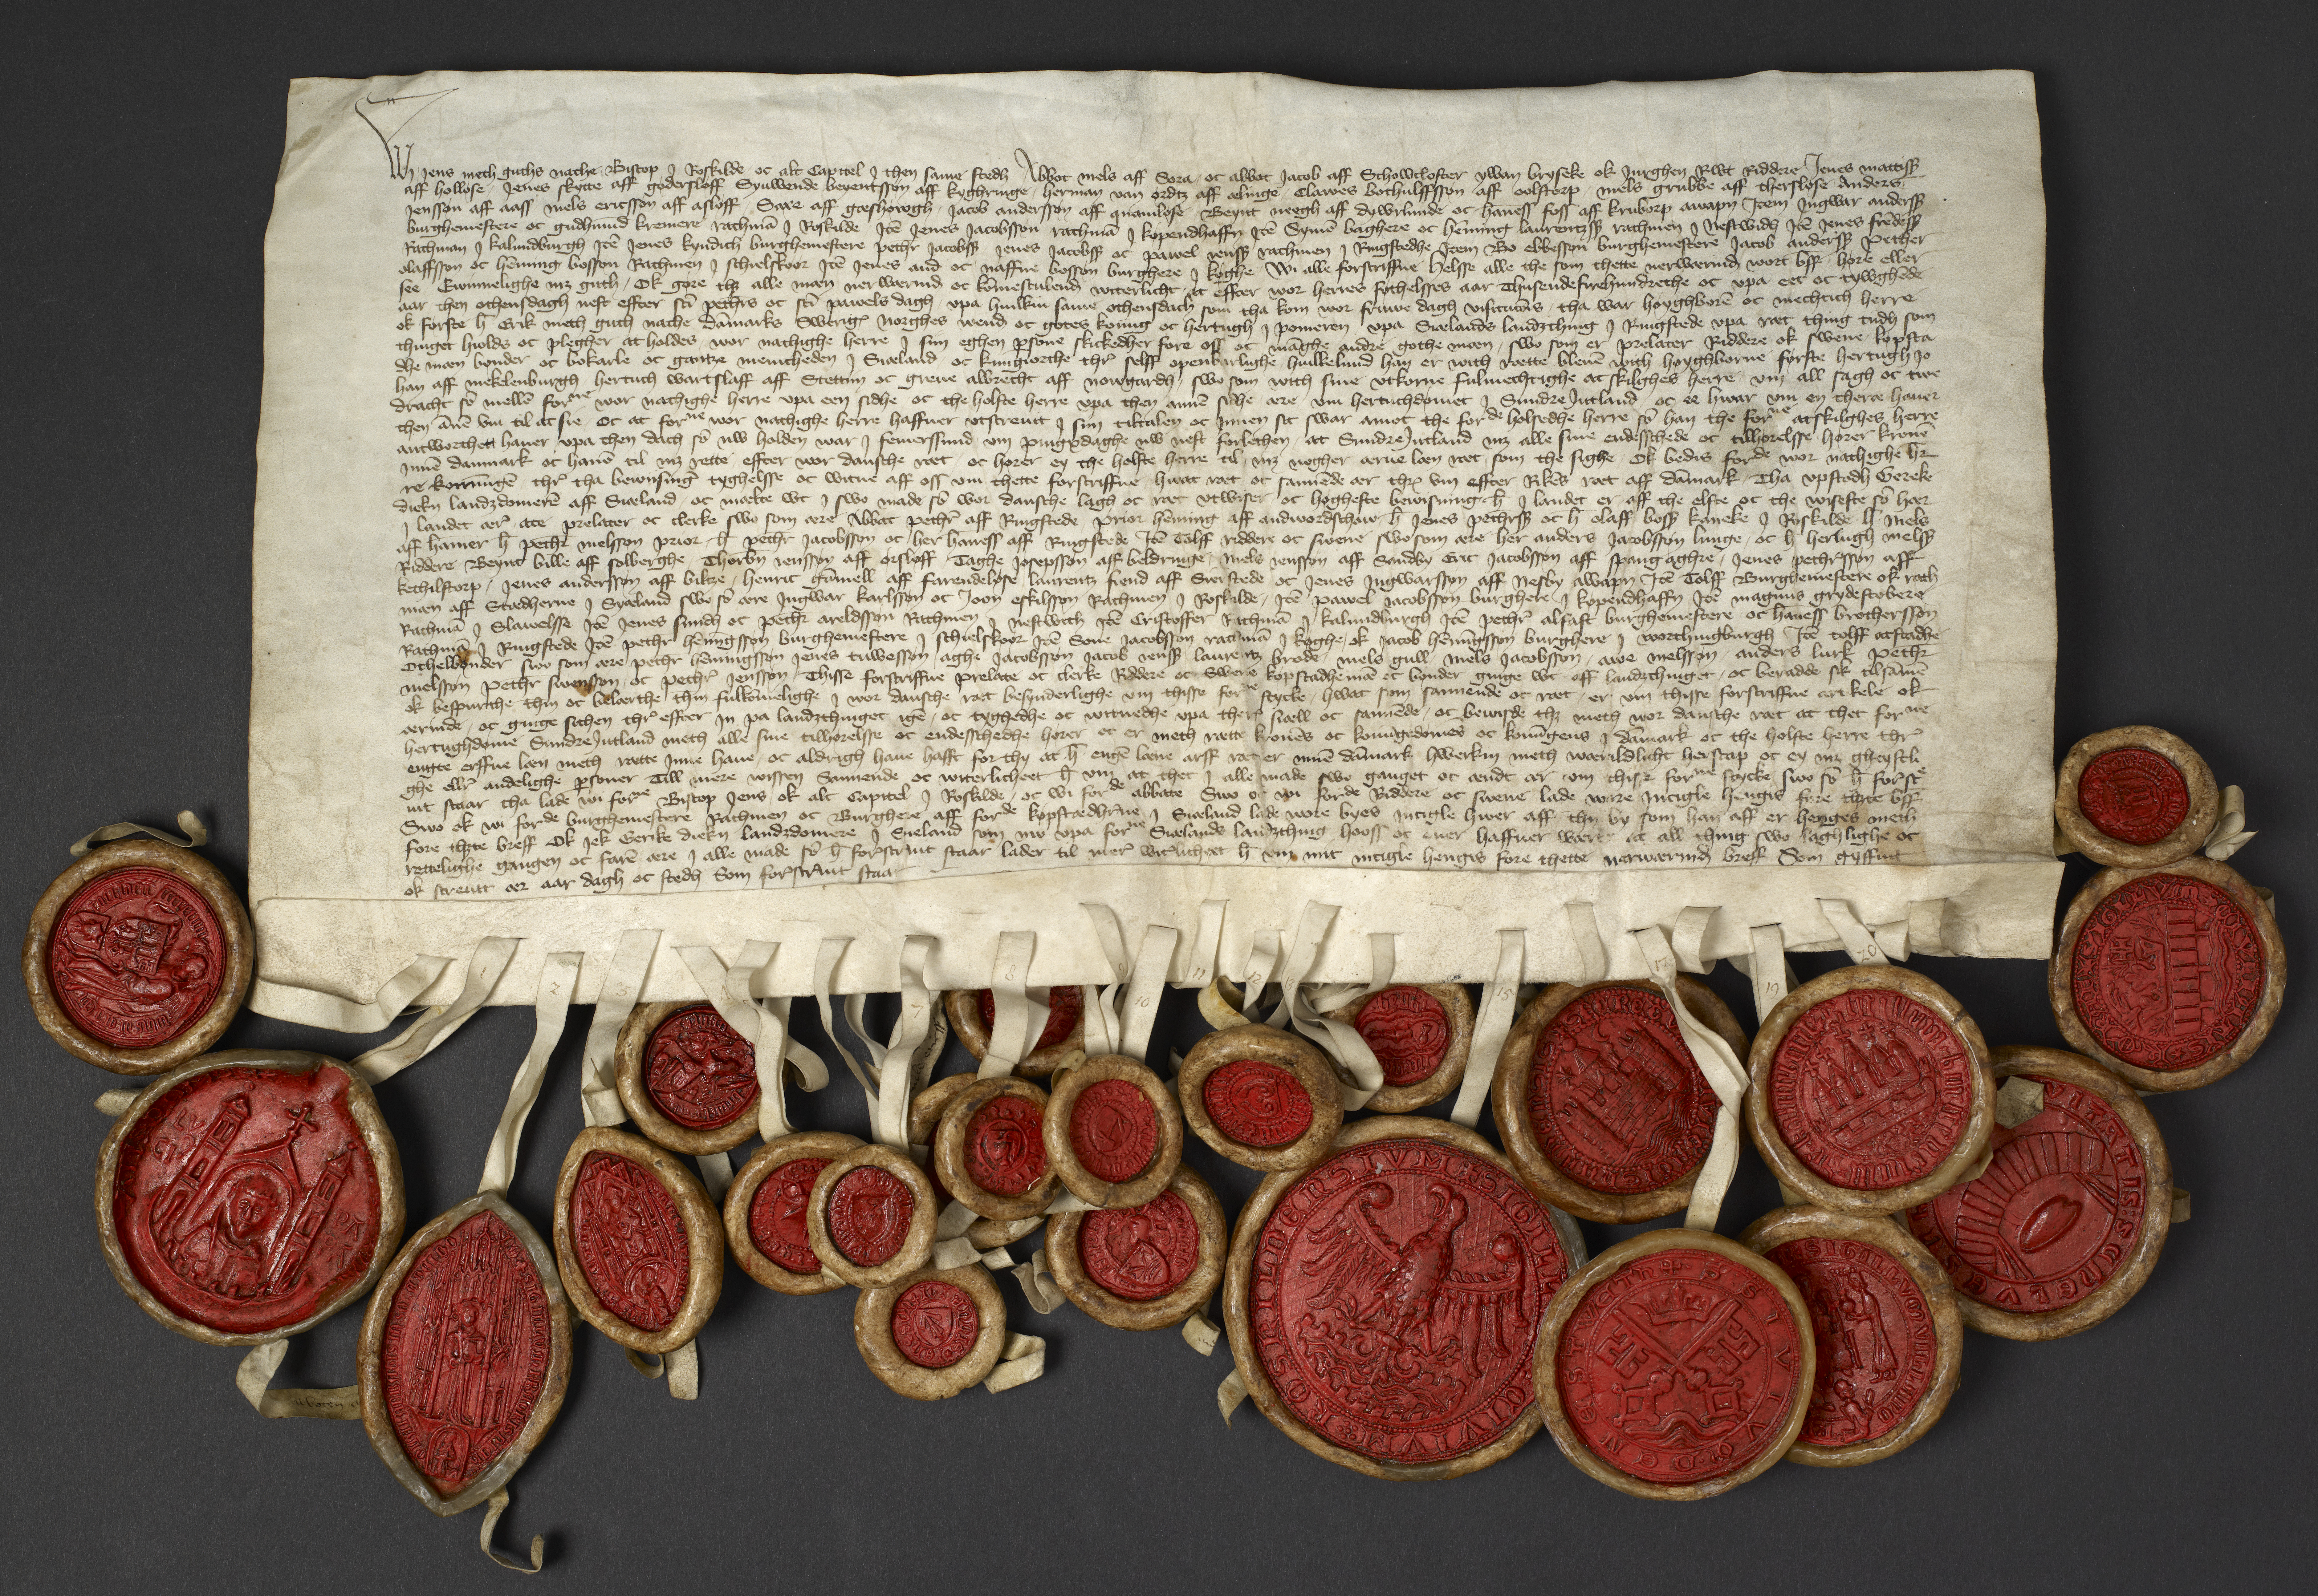 Diplomatarium Danicum opdateret med 207 nygamle dokumenter